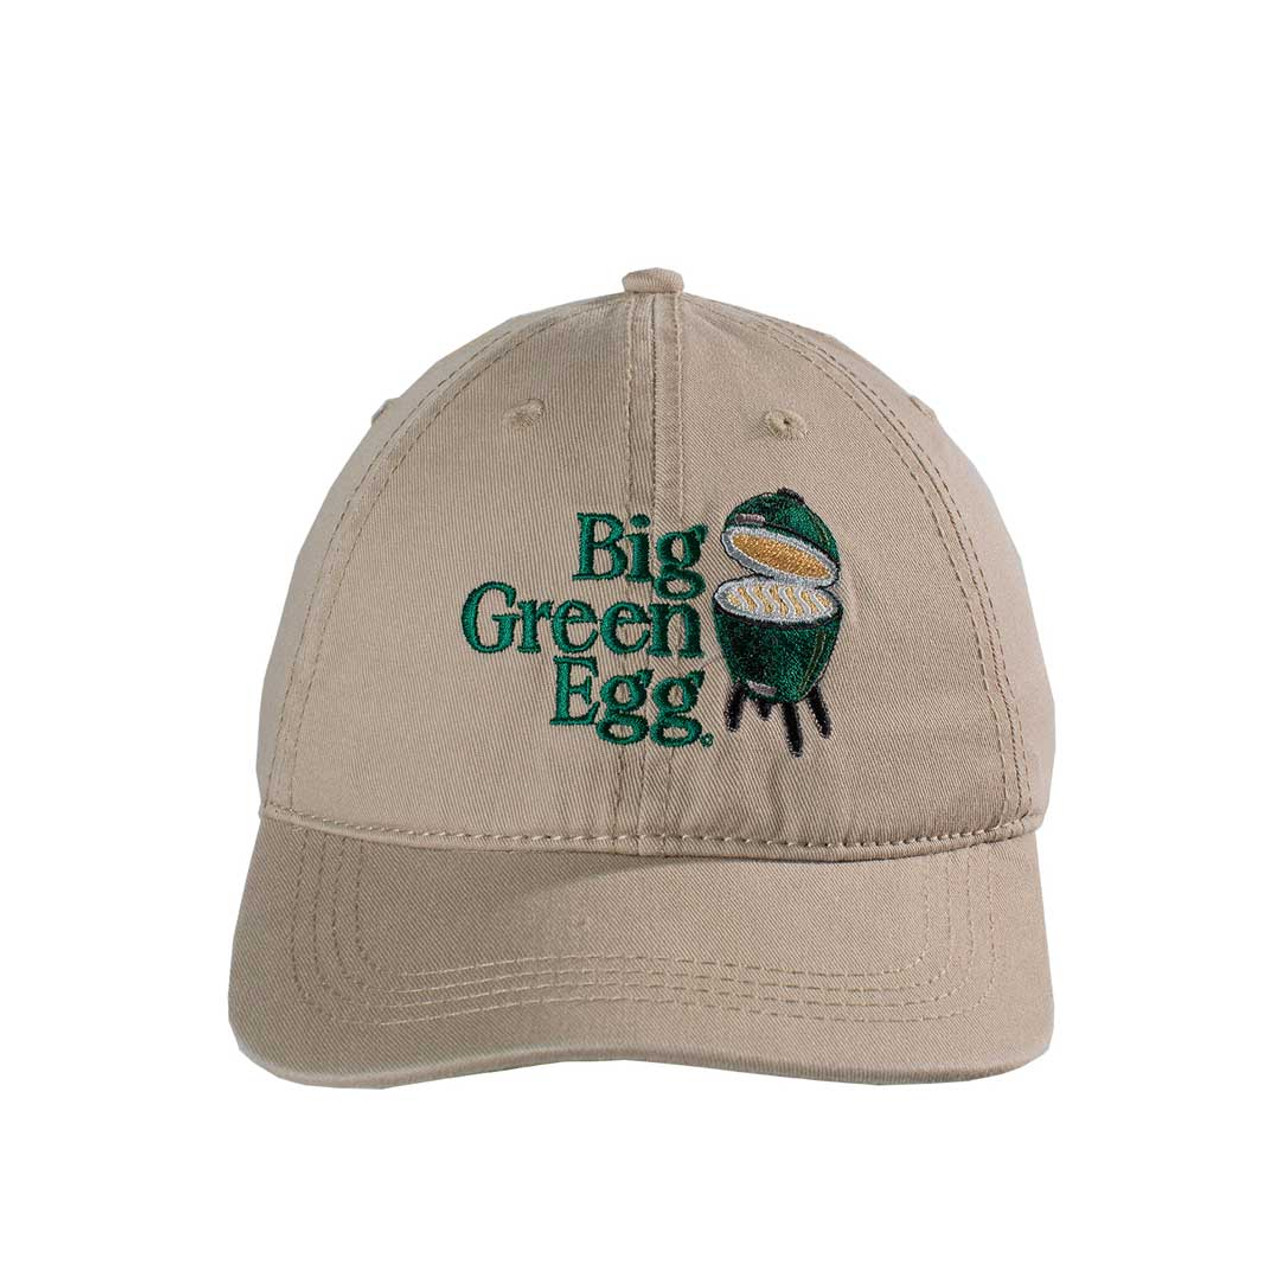 Big Green Egg Relaxed Logo Cap – Khaki - front view